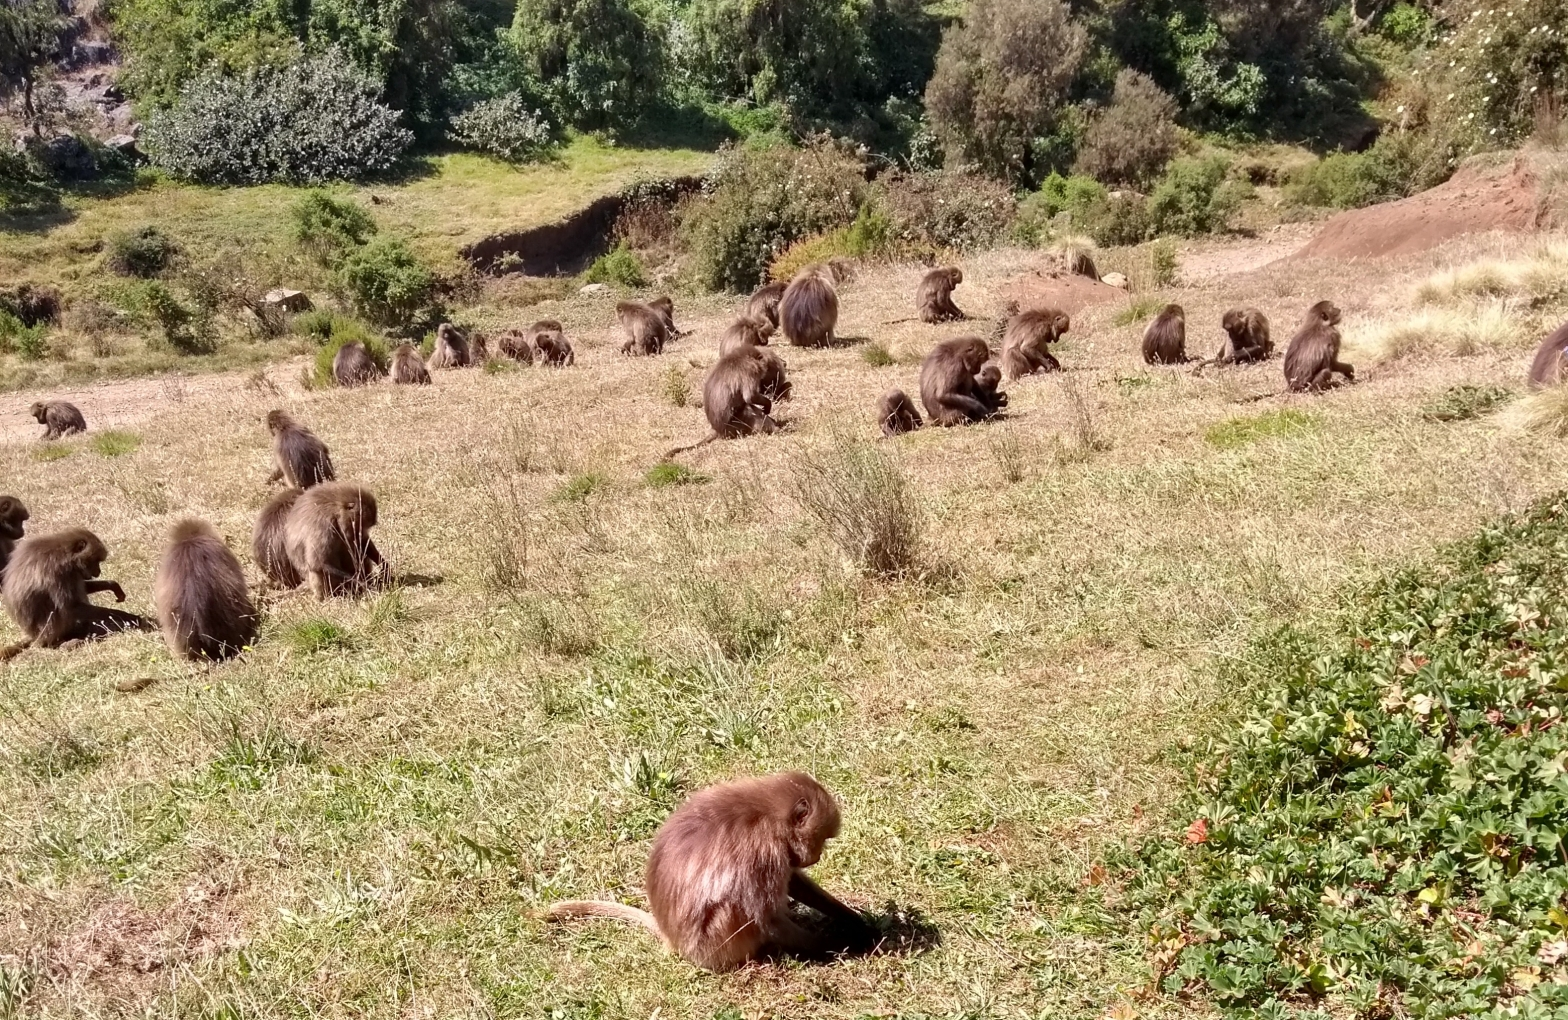 troupe of gelada monkeys sitting in the grass